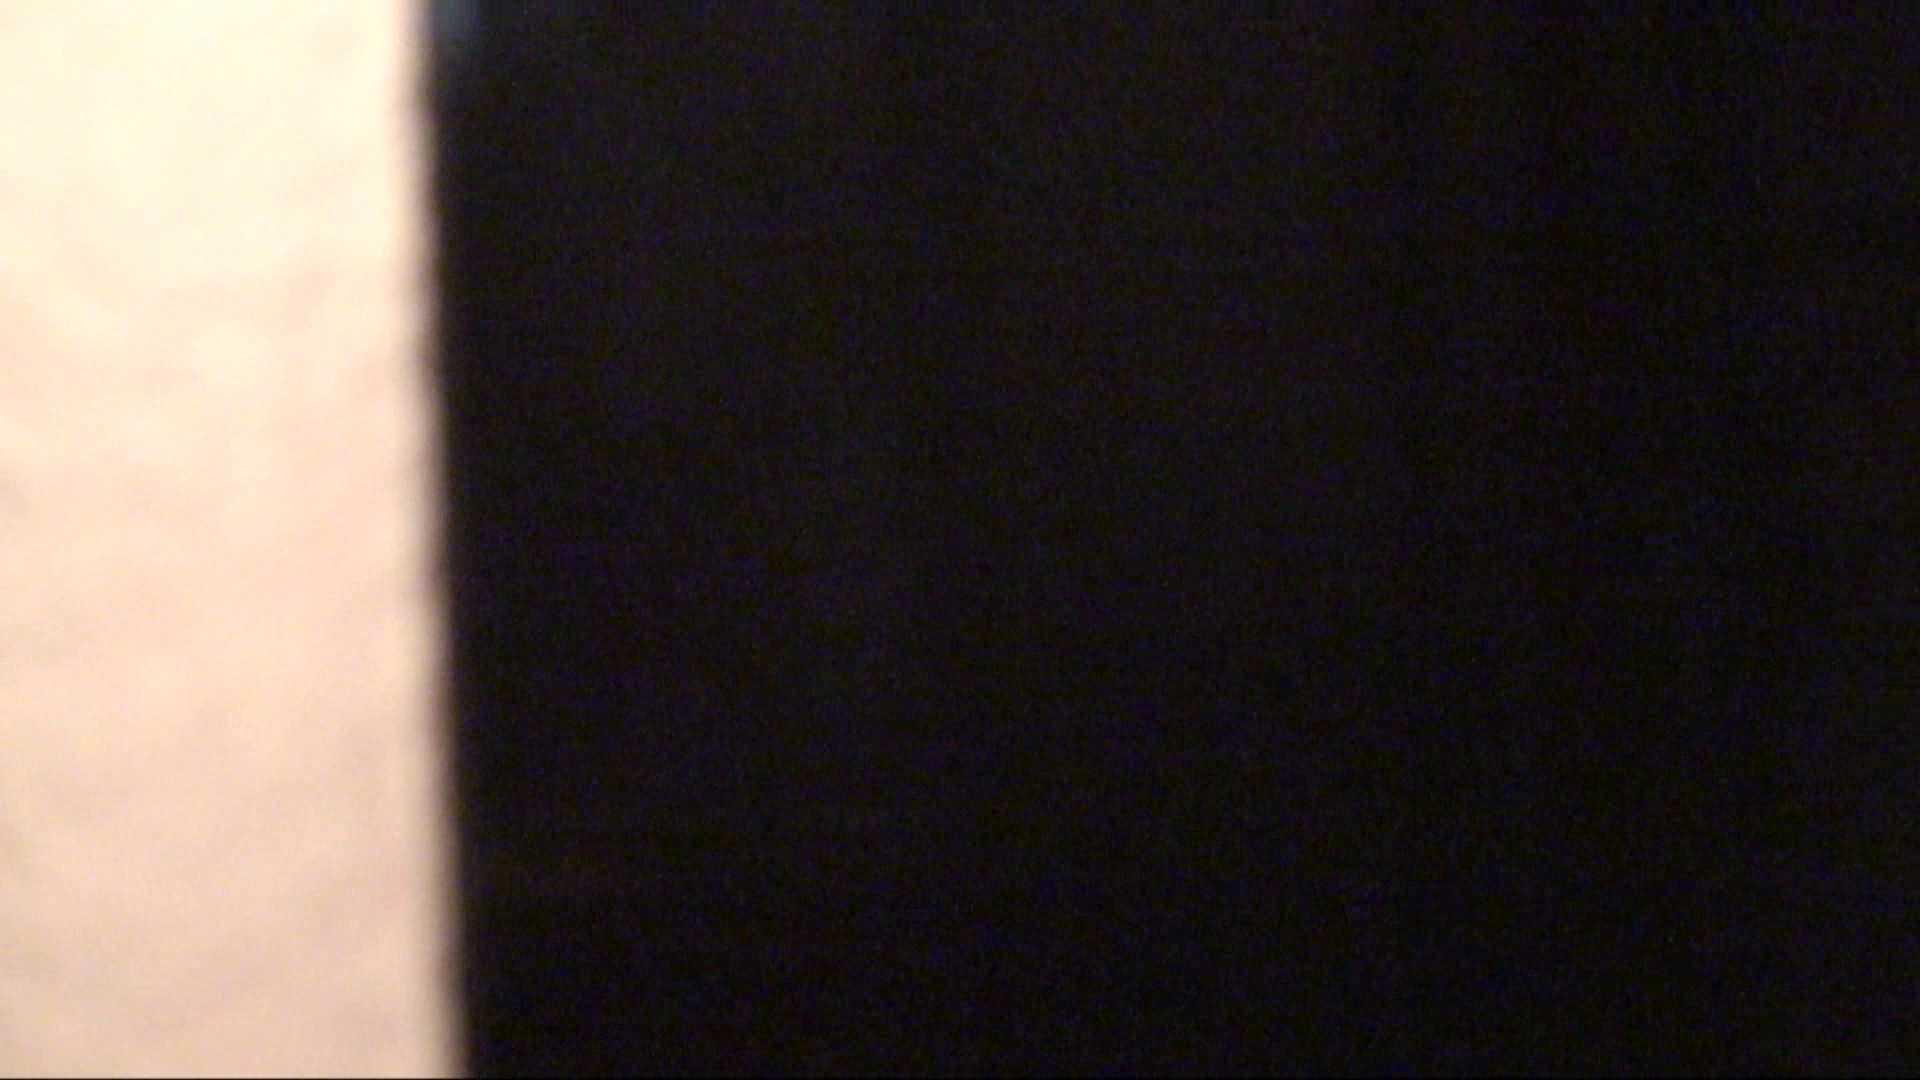 vol.01必見!白肌嬢の乳首が丸見え。極上美人のすっぴん顔をハイビジョンで! 覗き | 全身丸見え  43連発 12